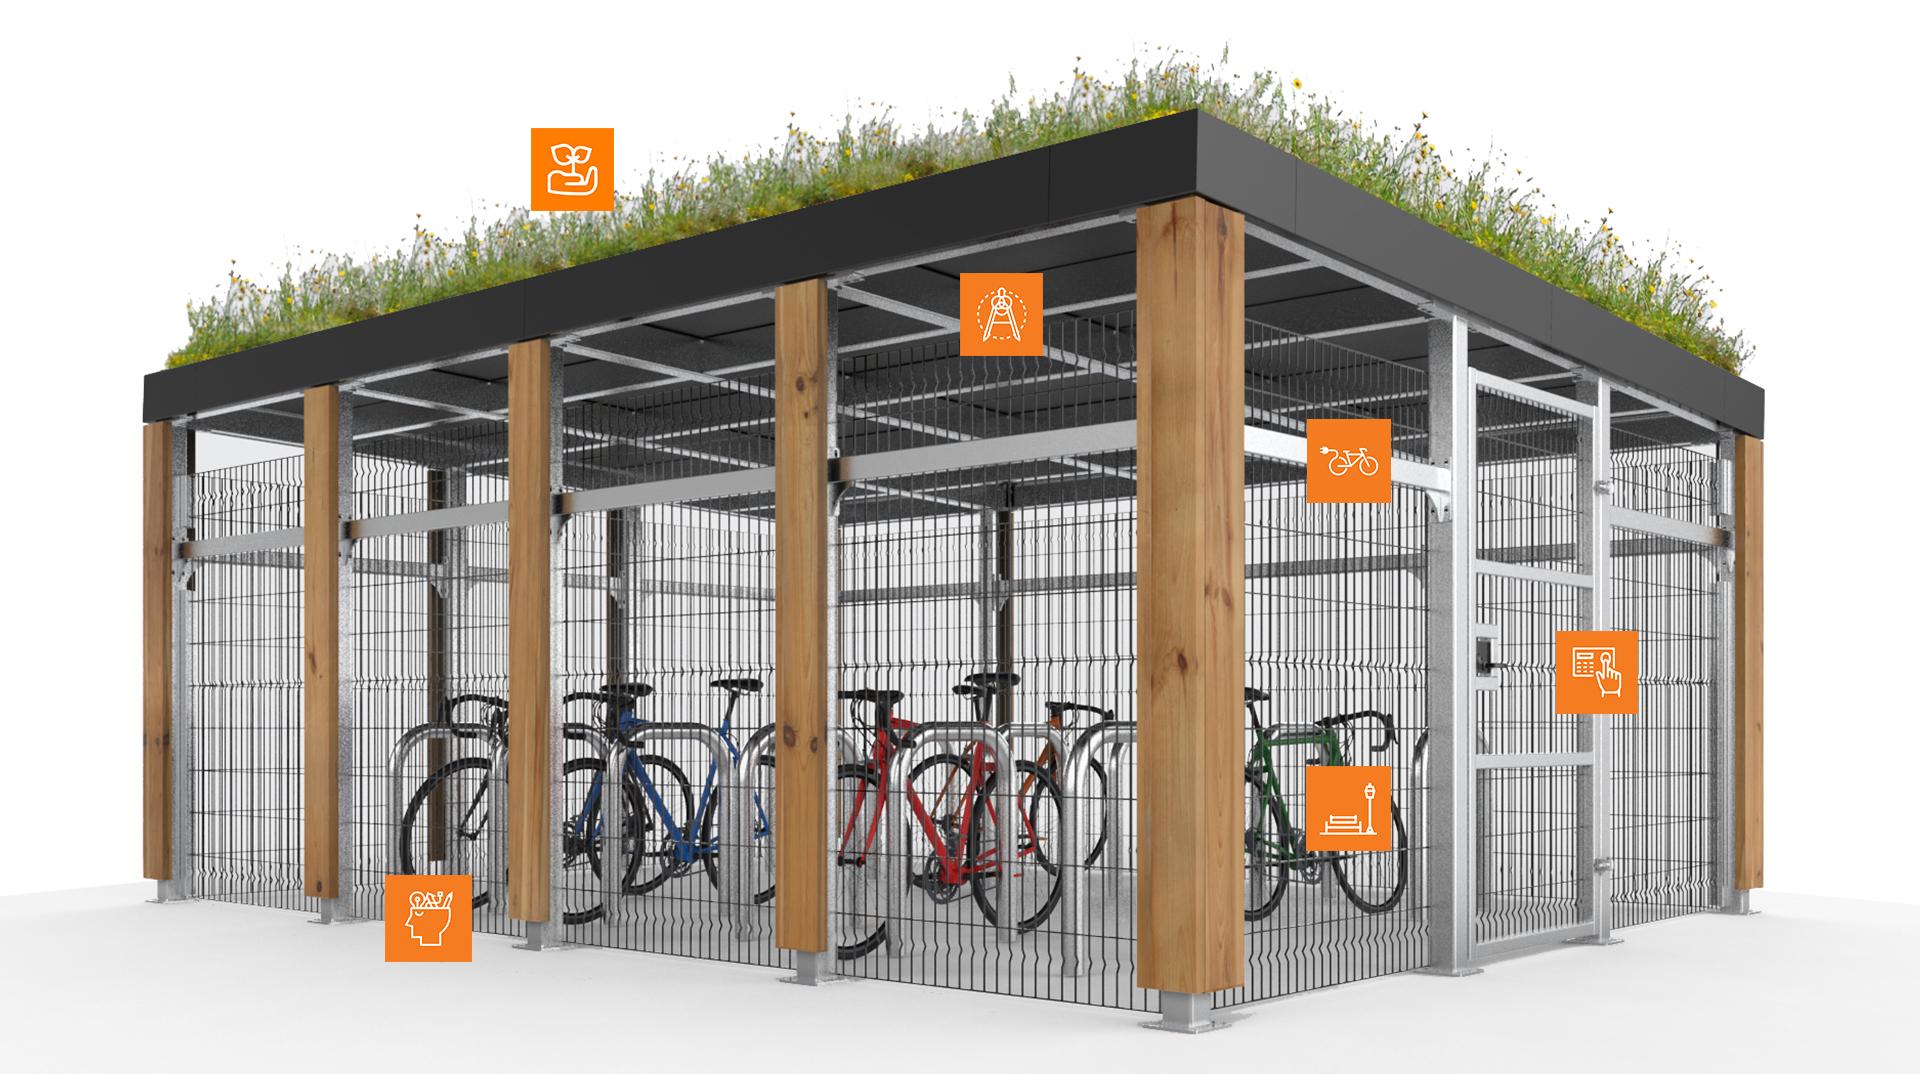 metroSTOR PCH Cycle Parking - metroSTOR